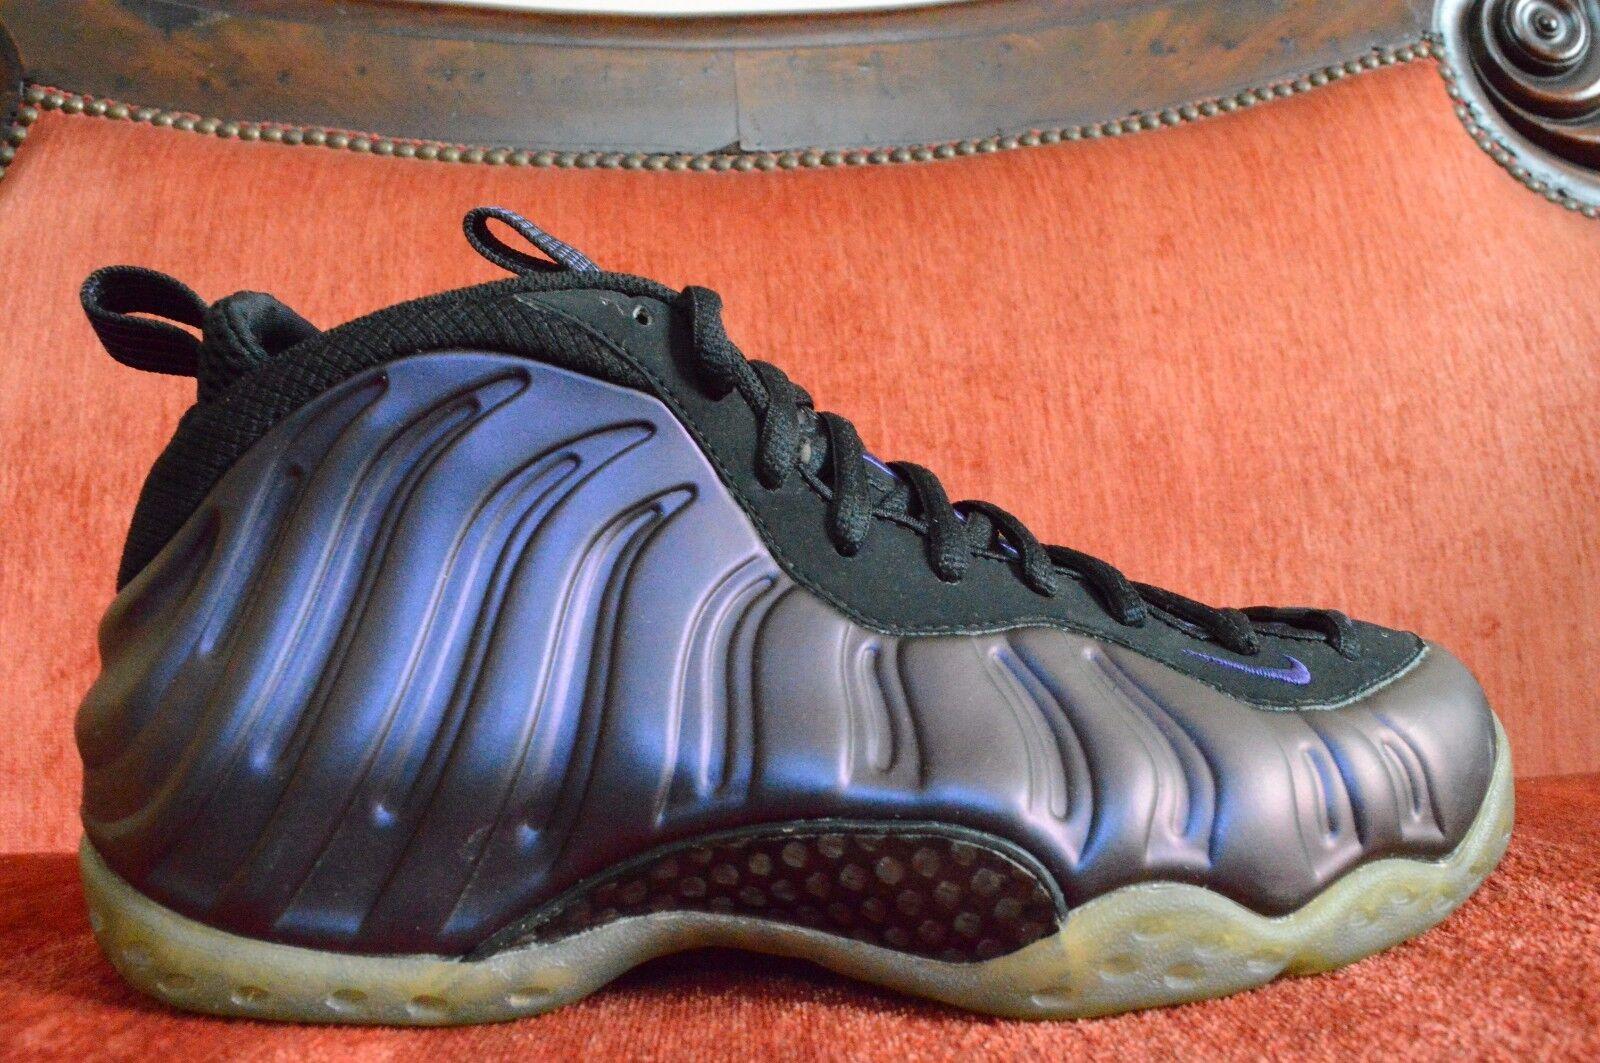 Nike Air Foamposite One 1 Black/Varsity Purple Eggplant 2009 314996-051 Size 9